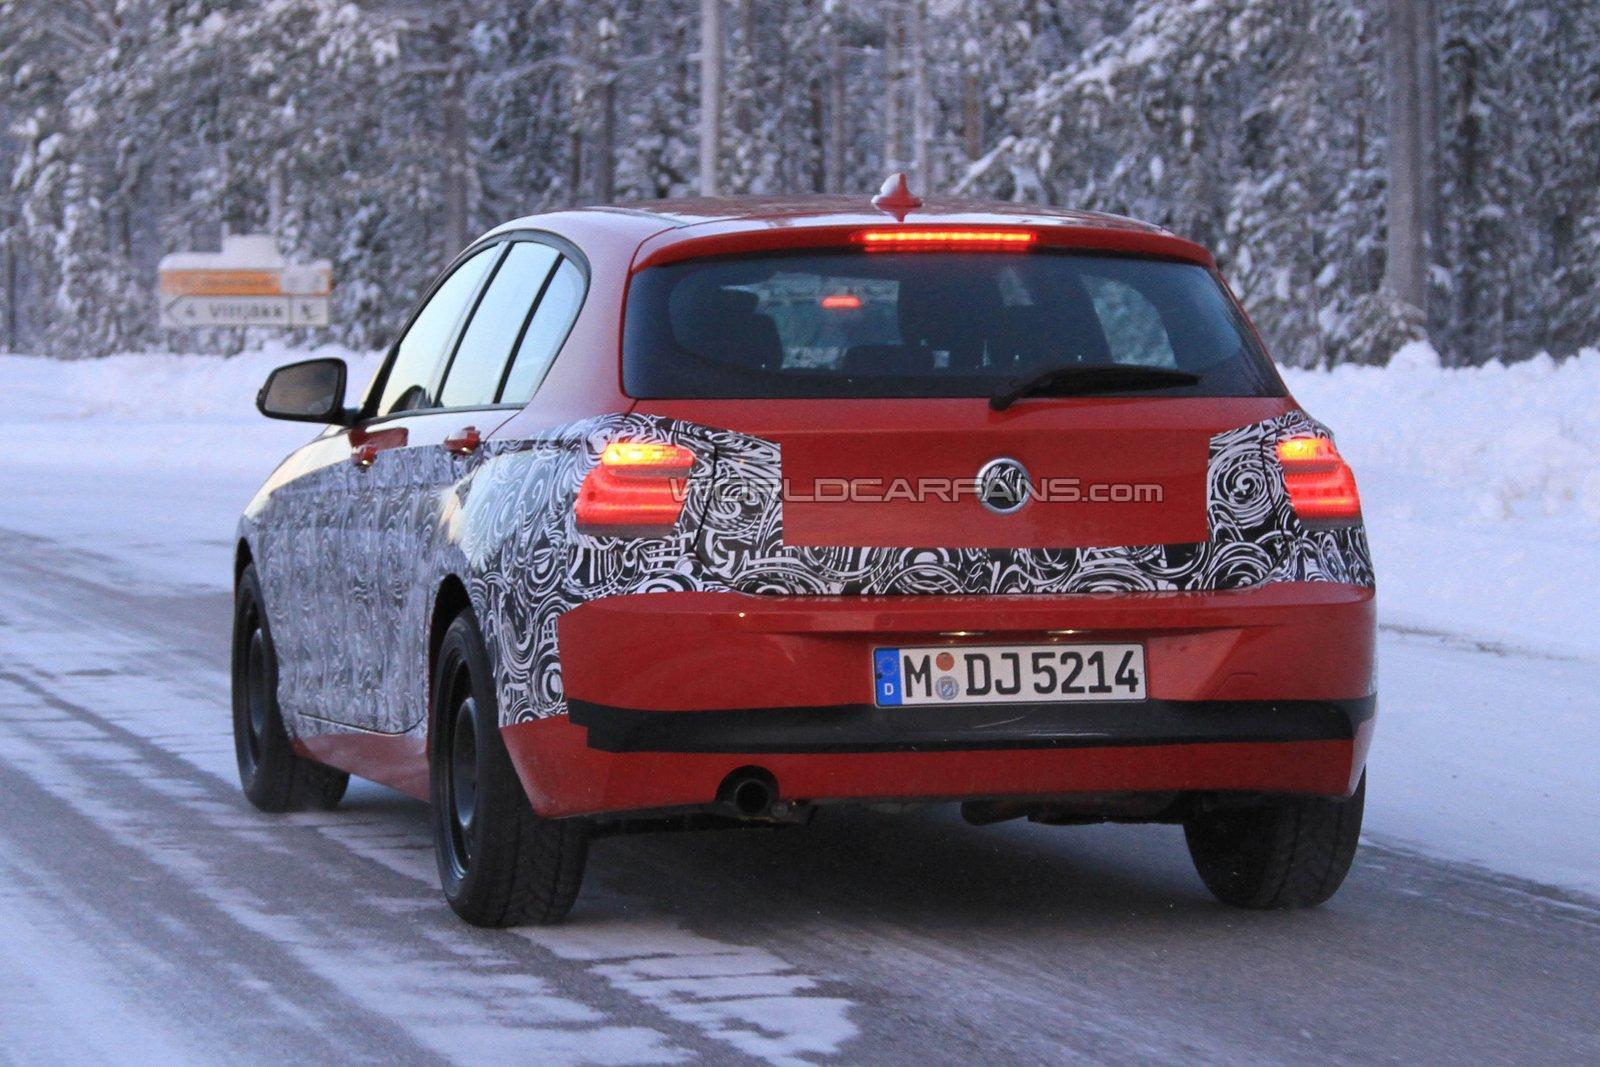 2012 BMW 1 Series F20 spied